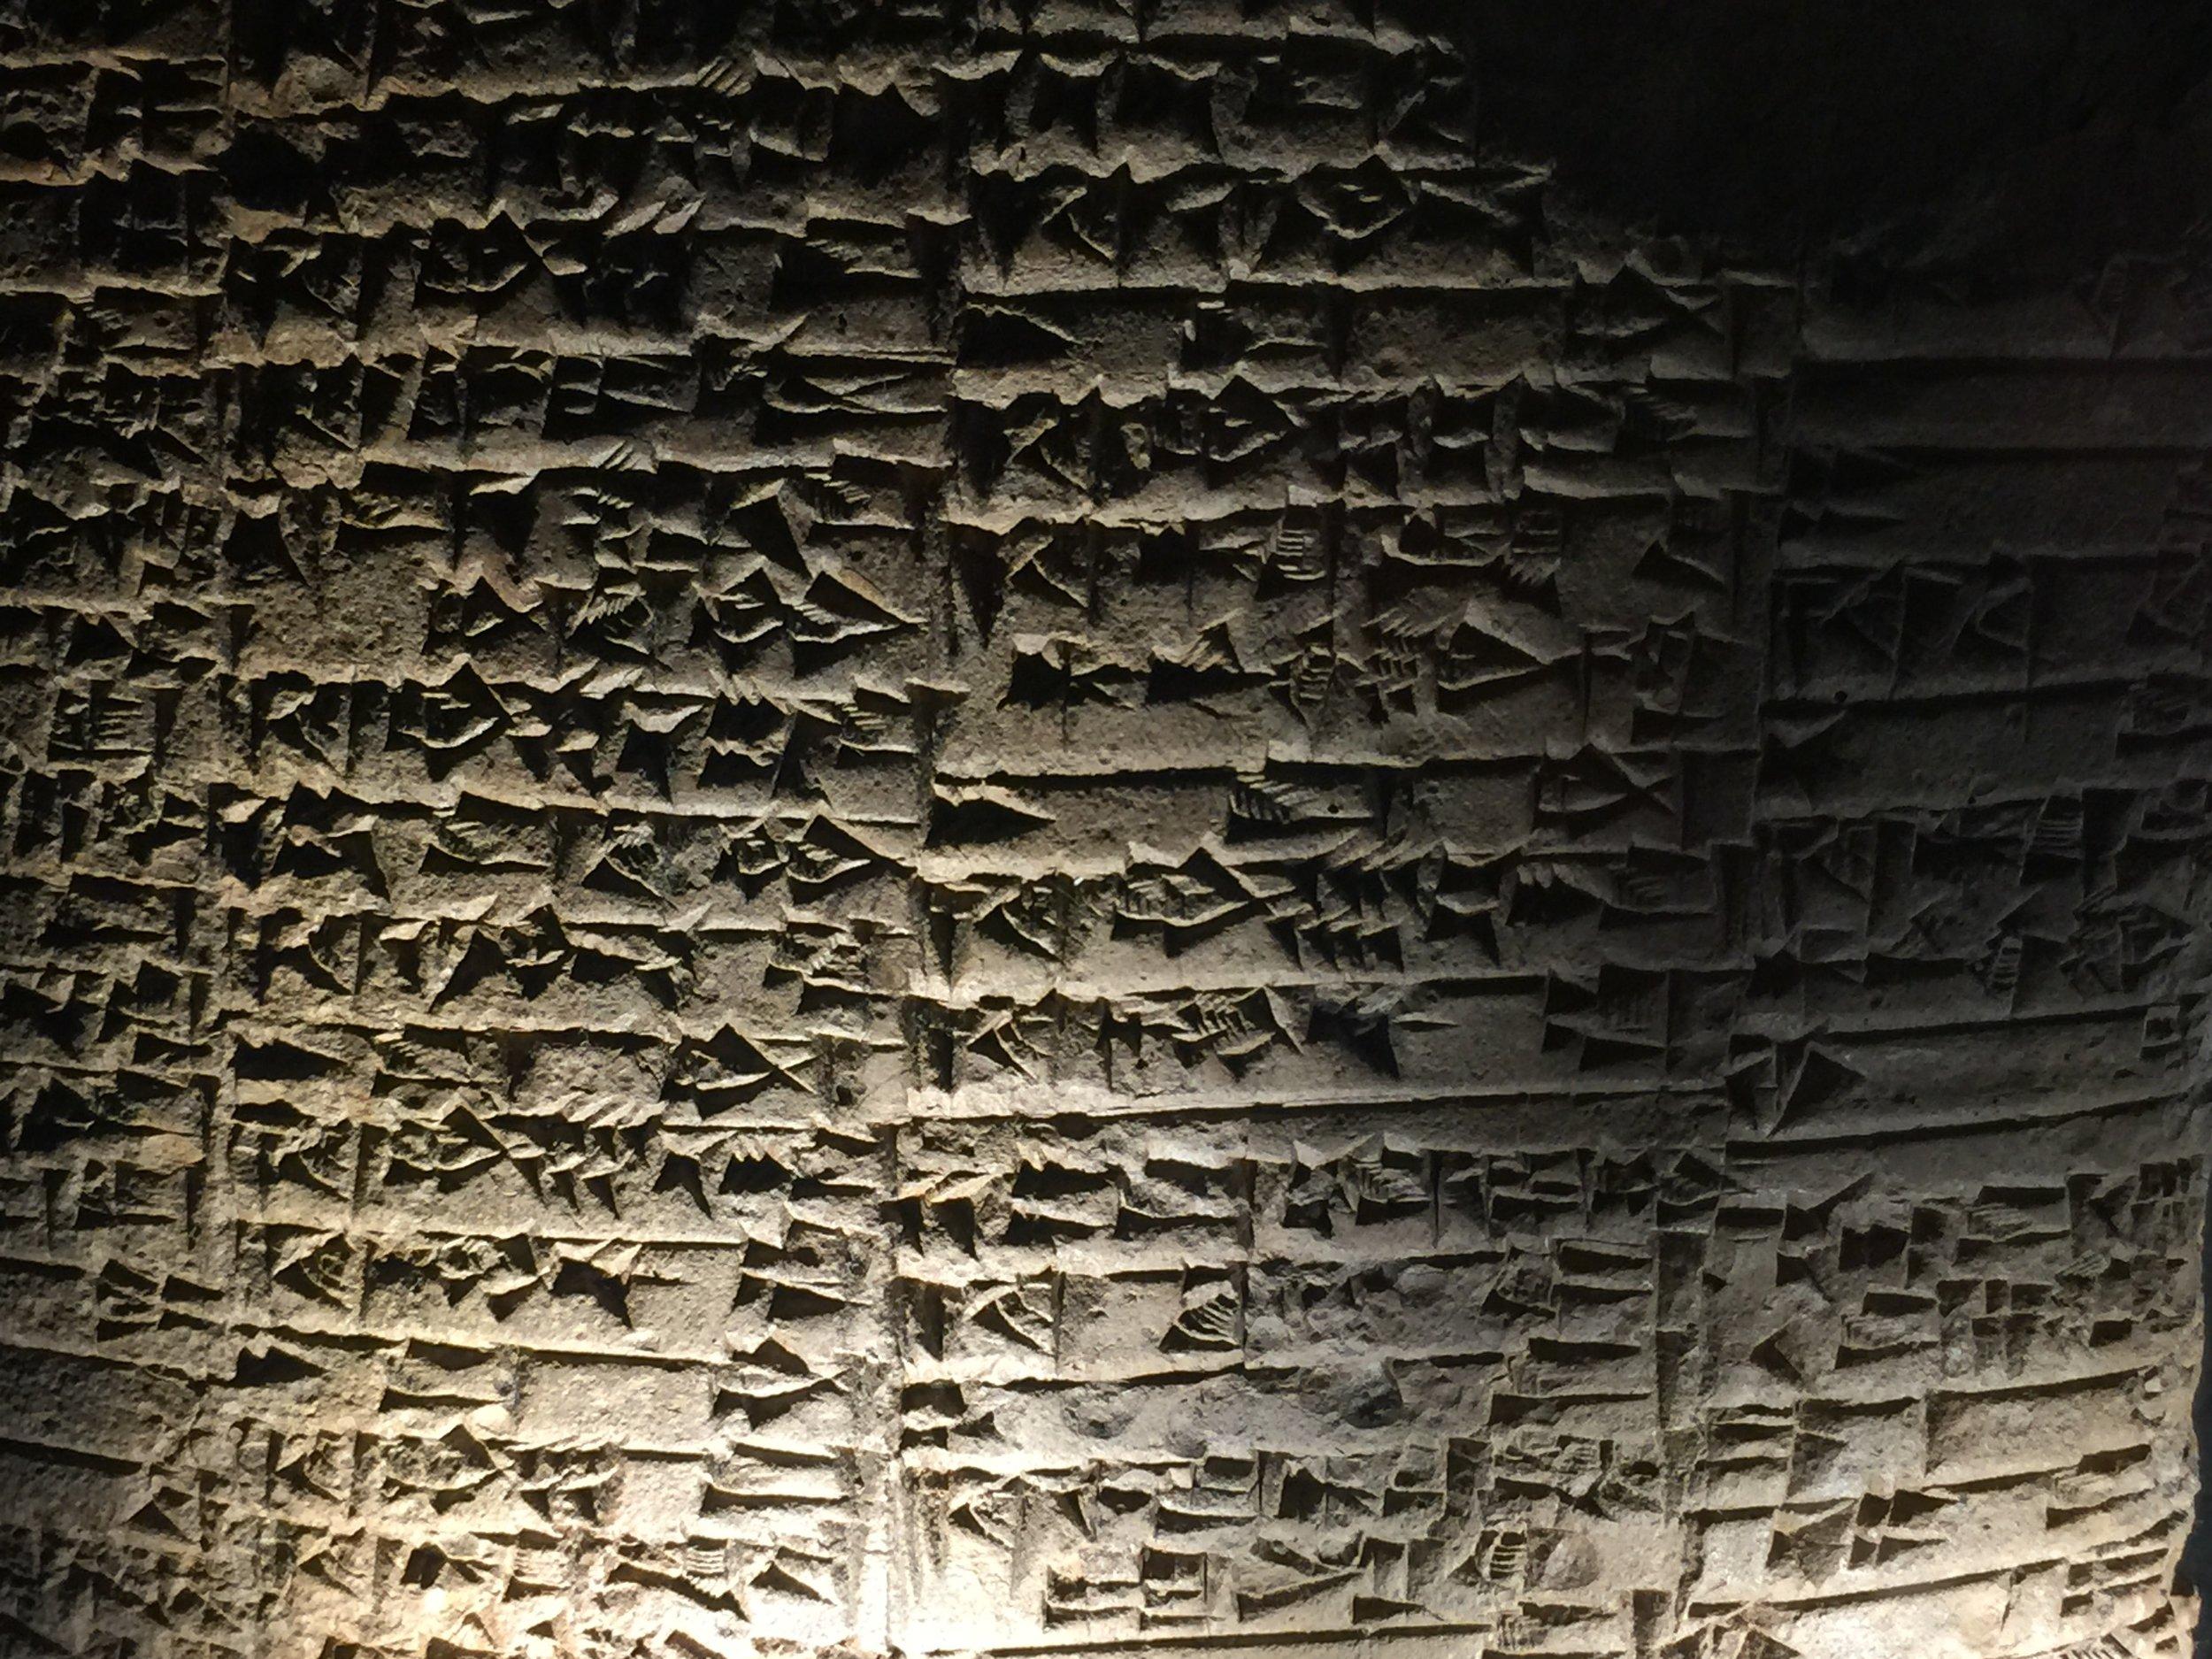 Inscribed cylinder of Nabuchadnezer II (605-562)